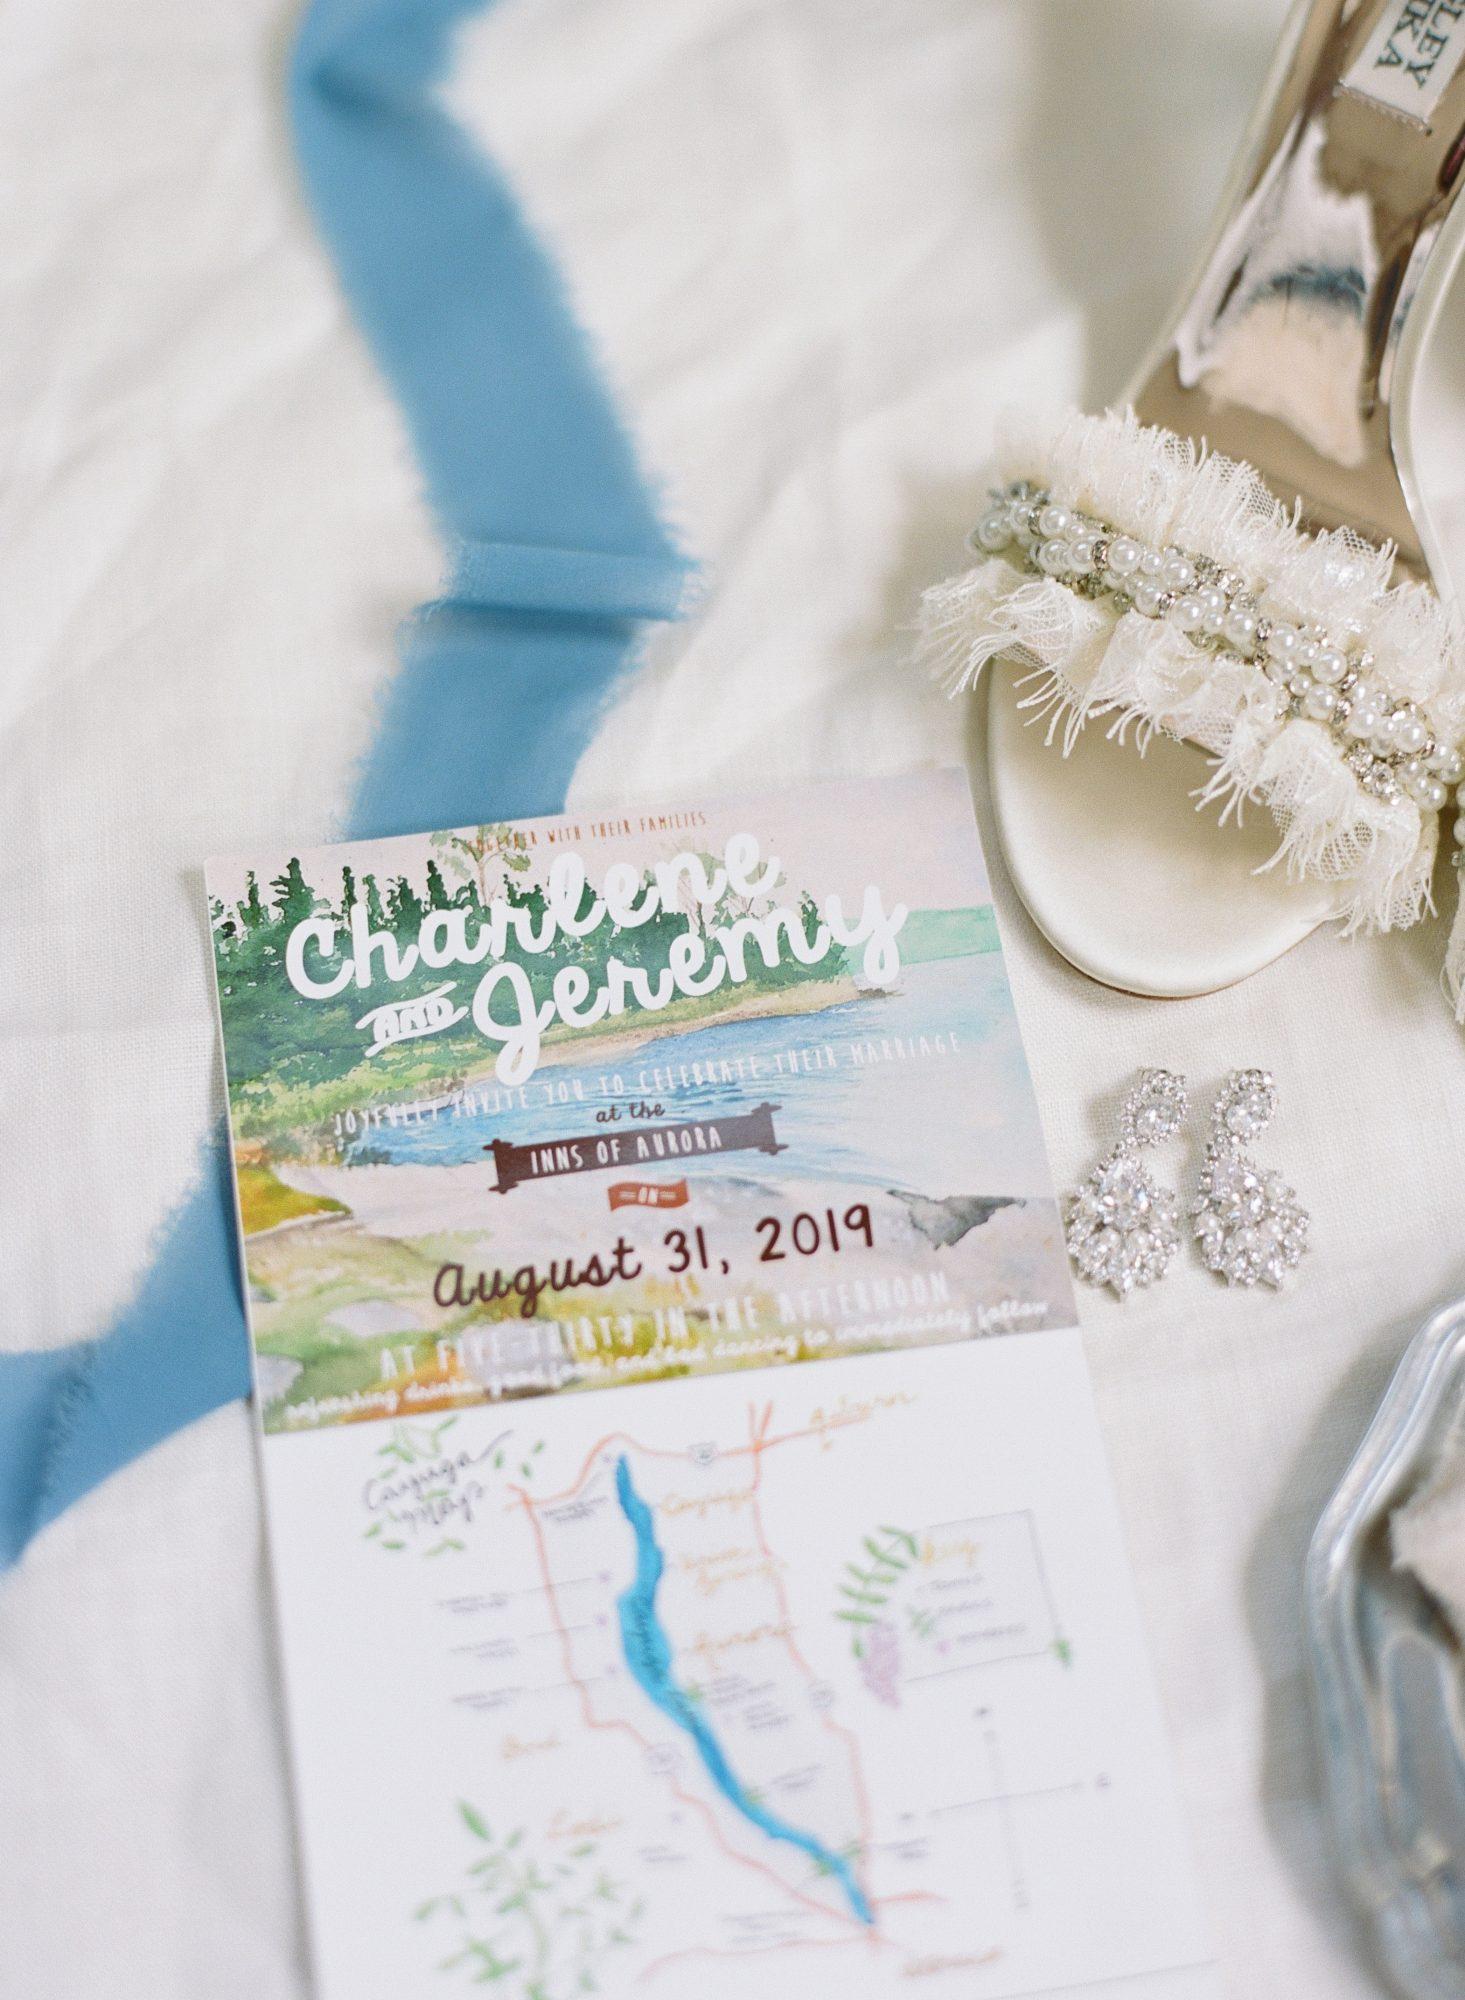 charlene jeremy wedding invitations with map